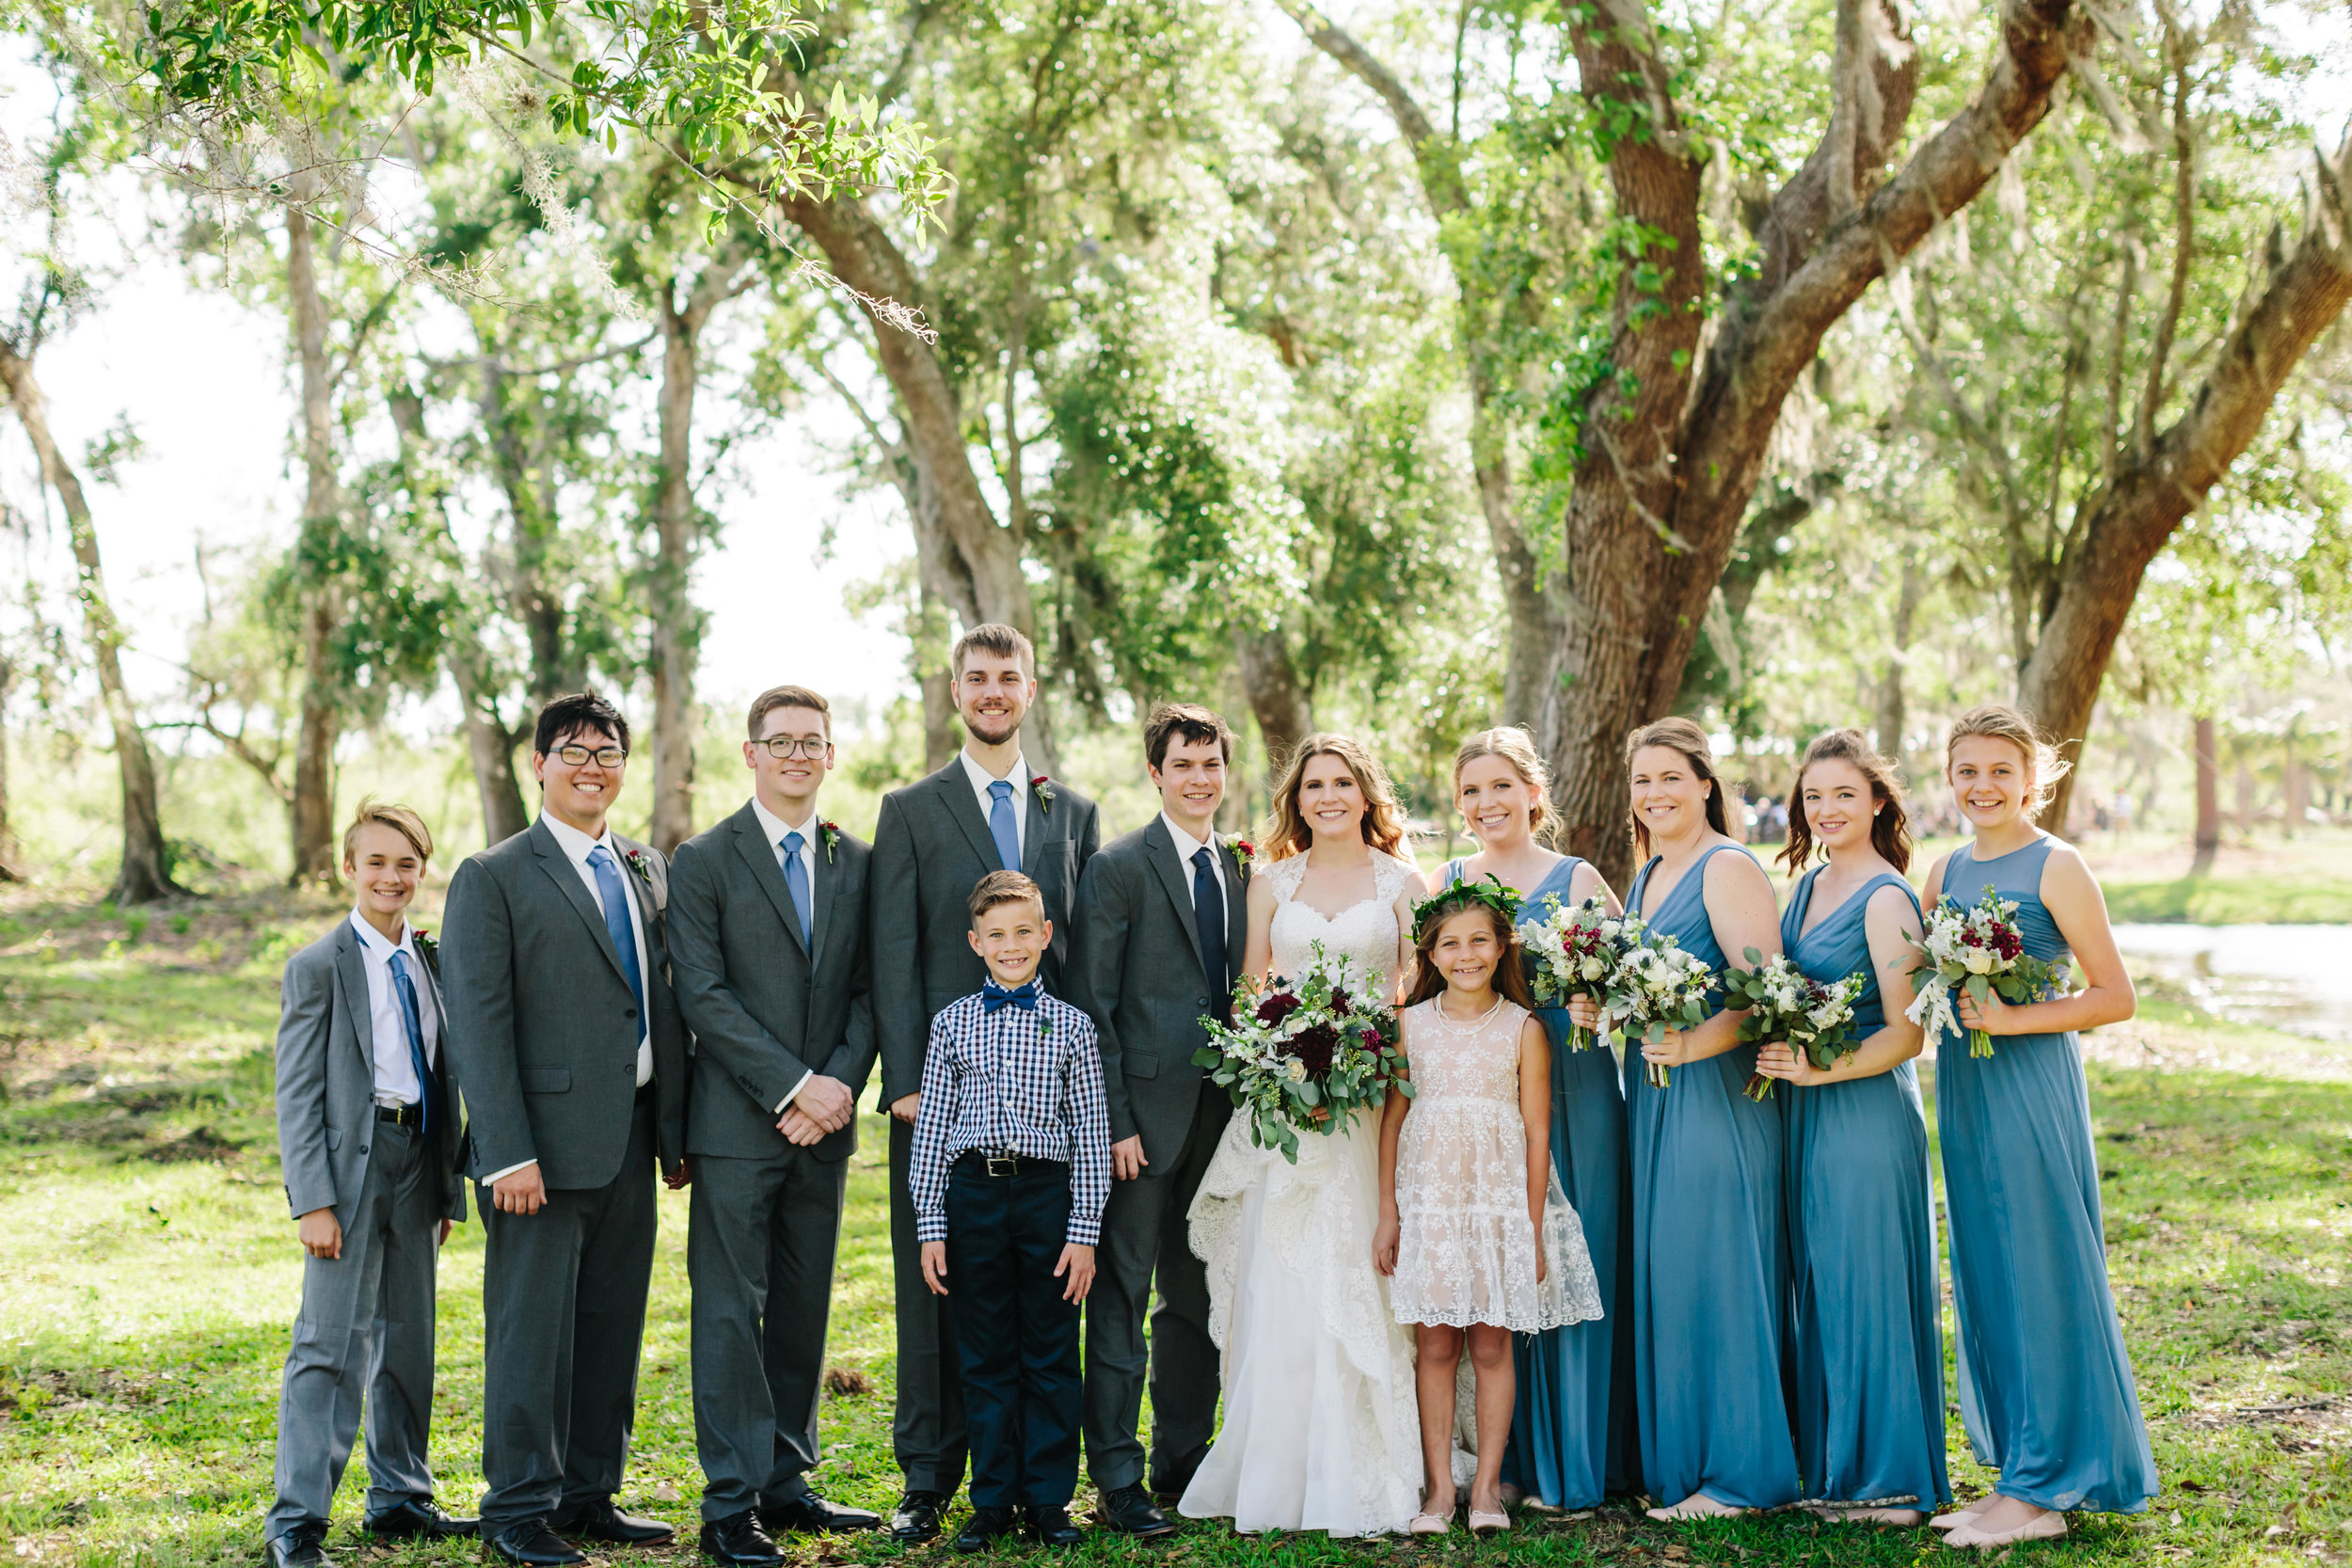 2018.04.14 Zak and Jamisyn Unrue Black Willow Barn Wedding Finals-546.jpg